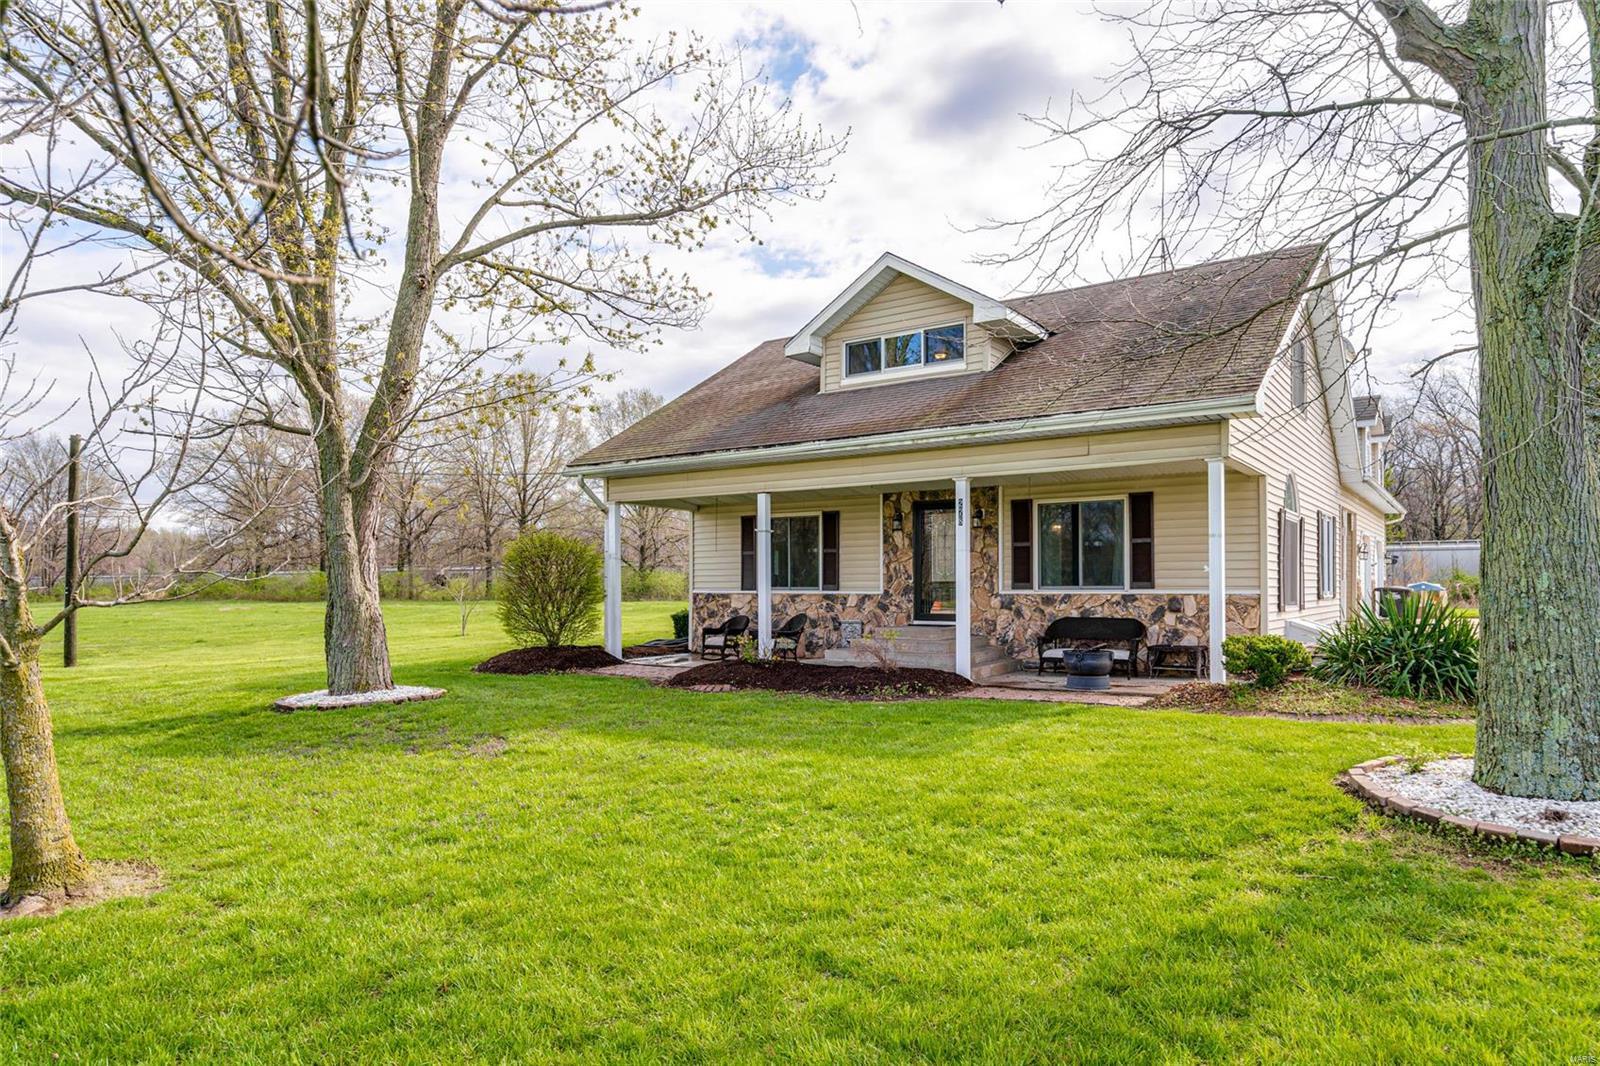 278 Canadian Property Photo - Staunton, IL real estate listing